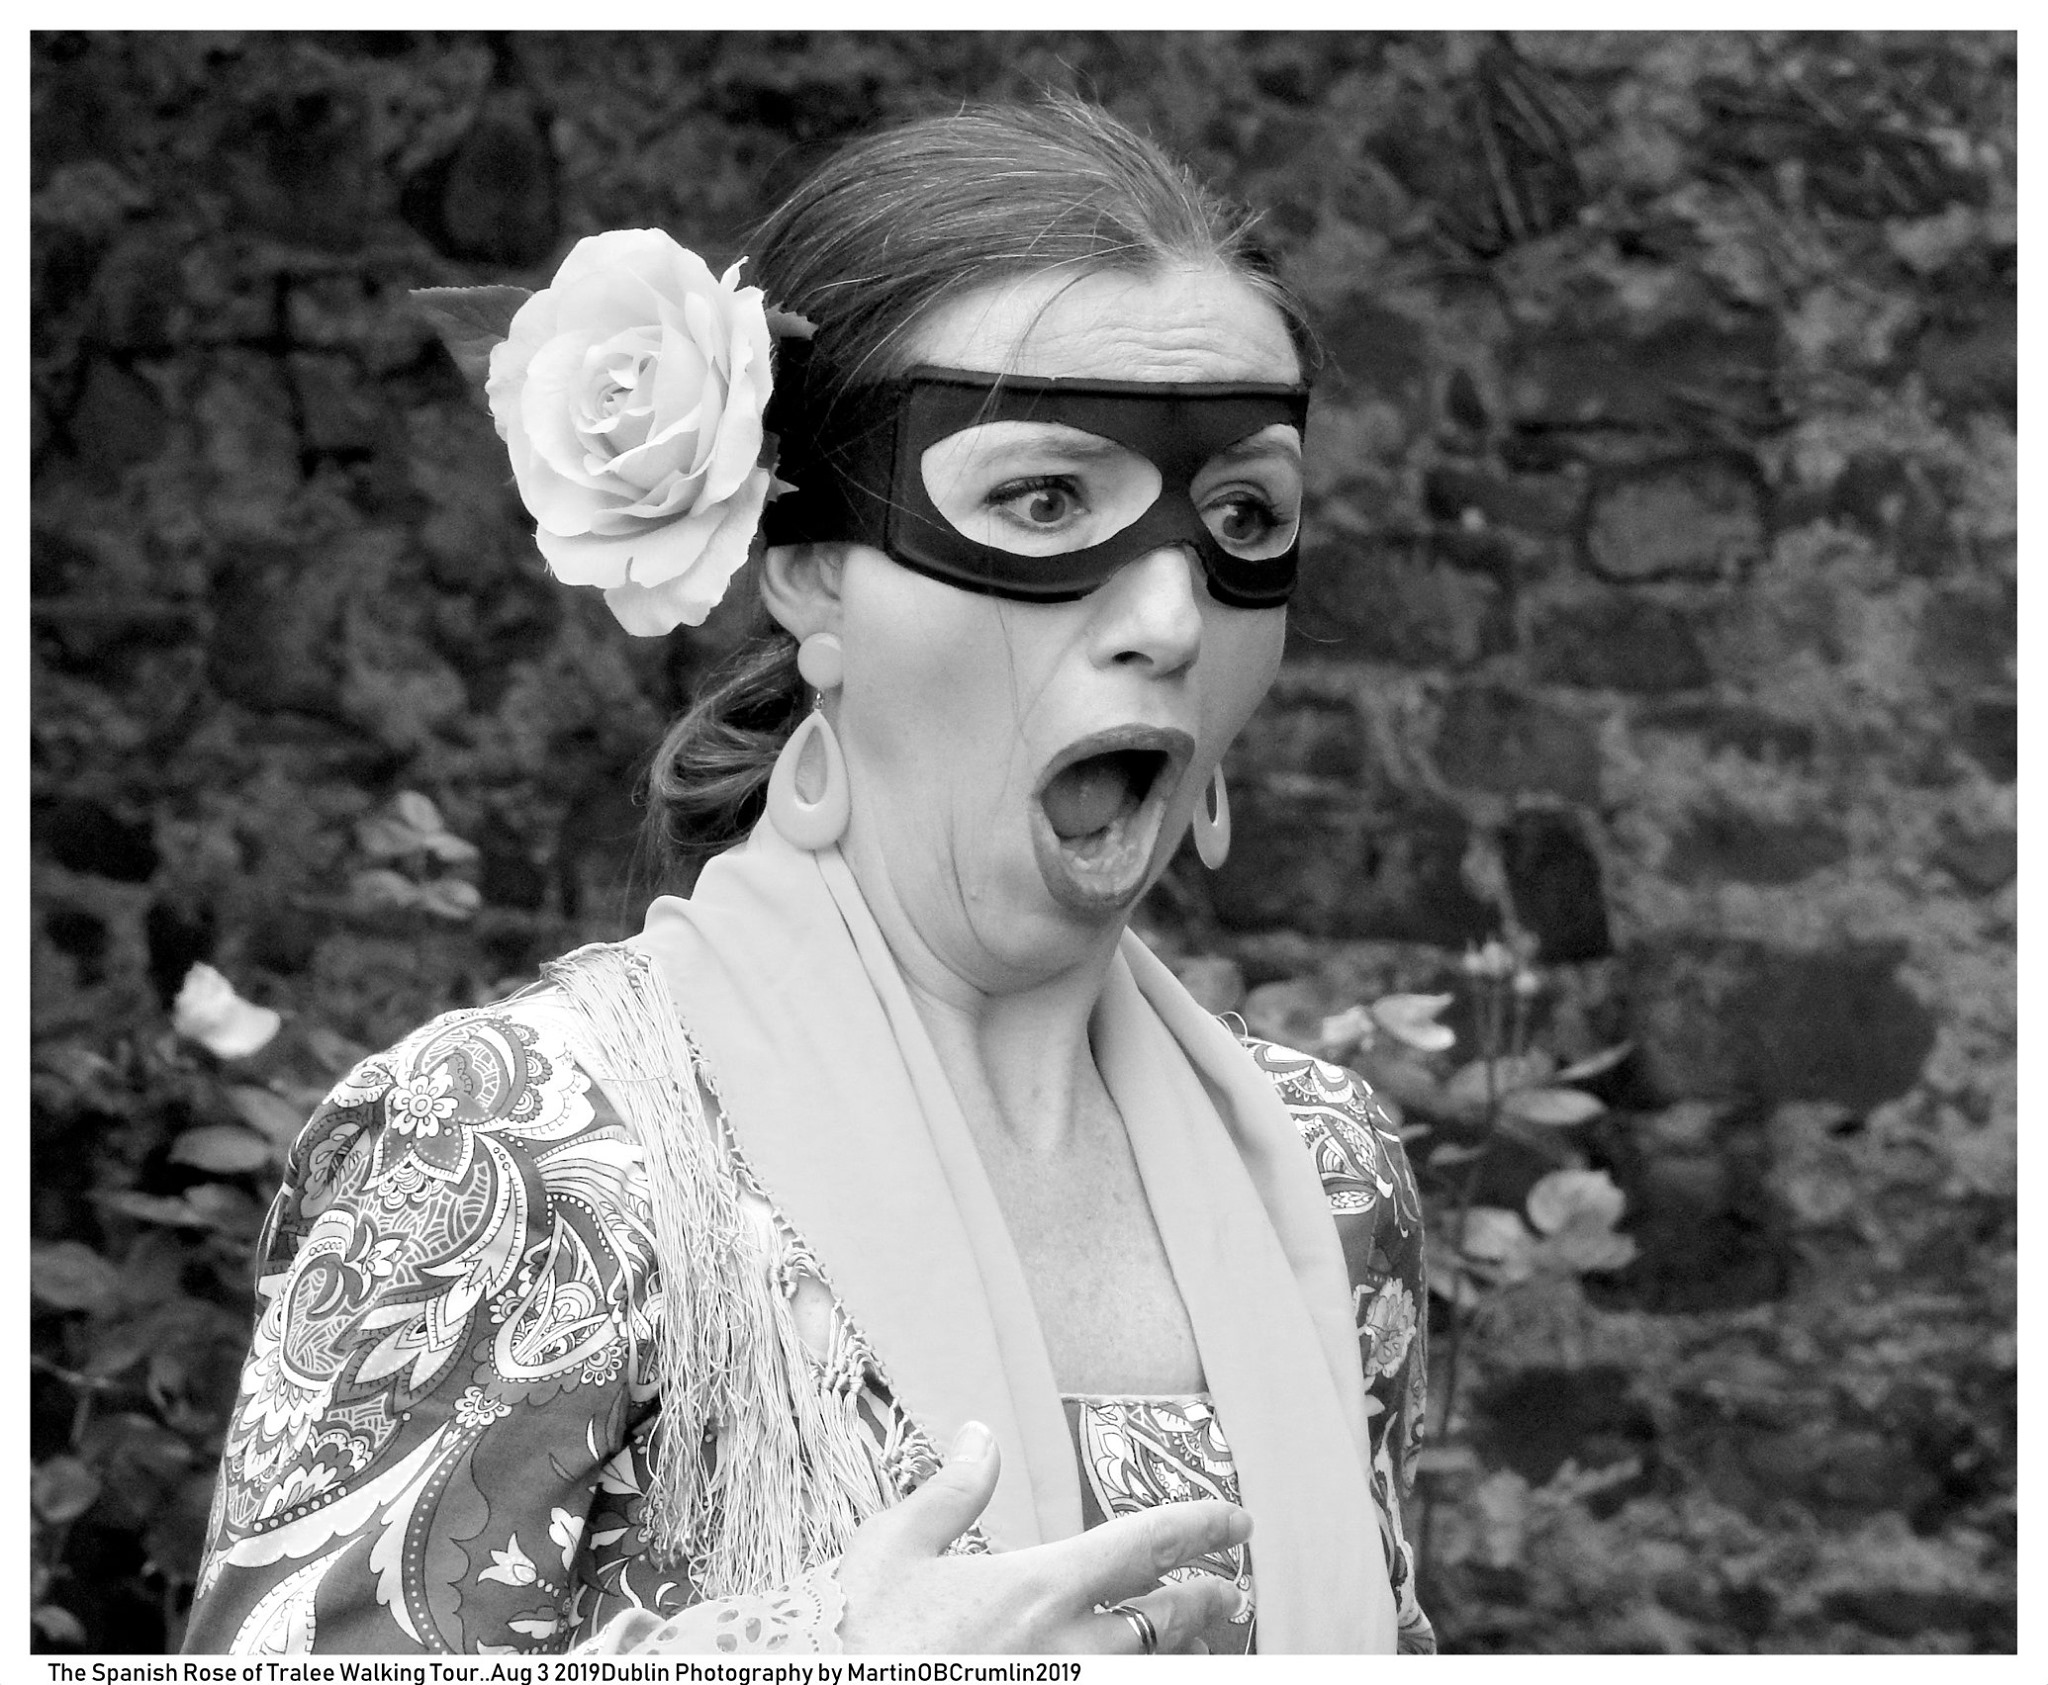 The Spanish Rose of Tralee Walking Tour Limerick